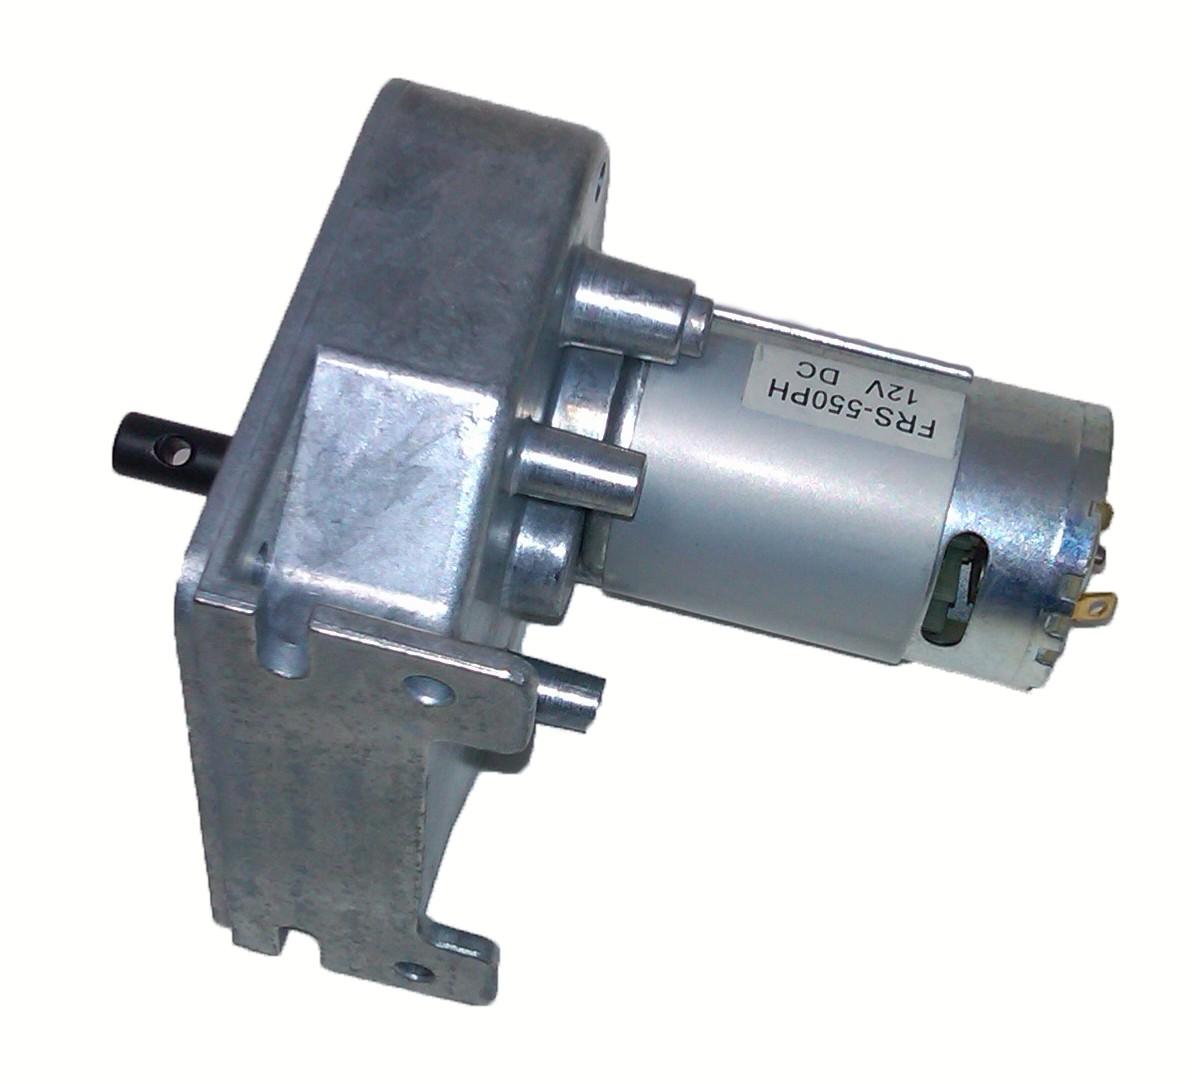 Gto Pro Service Parts Pro 1000 1200